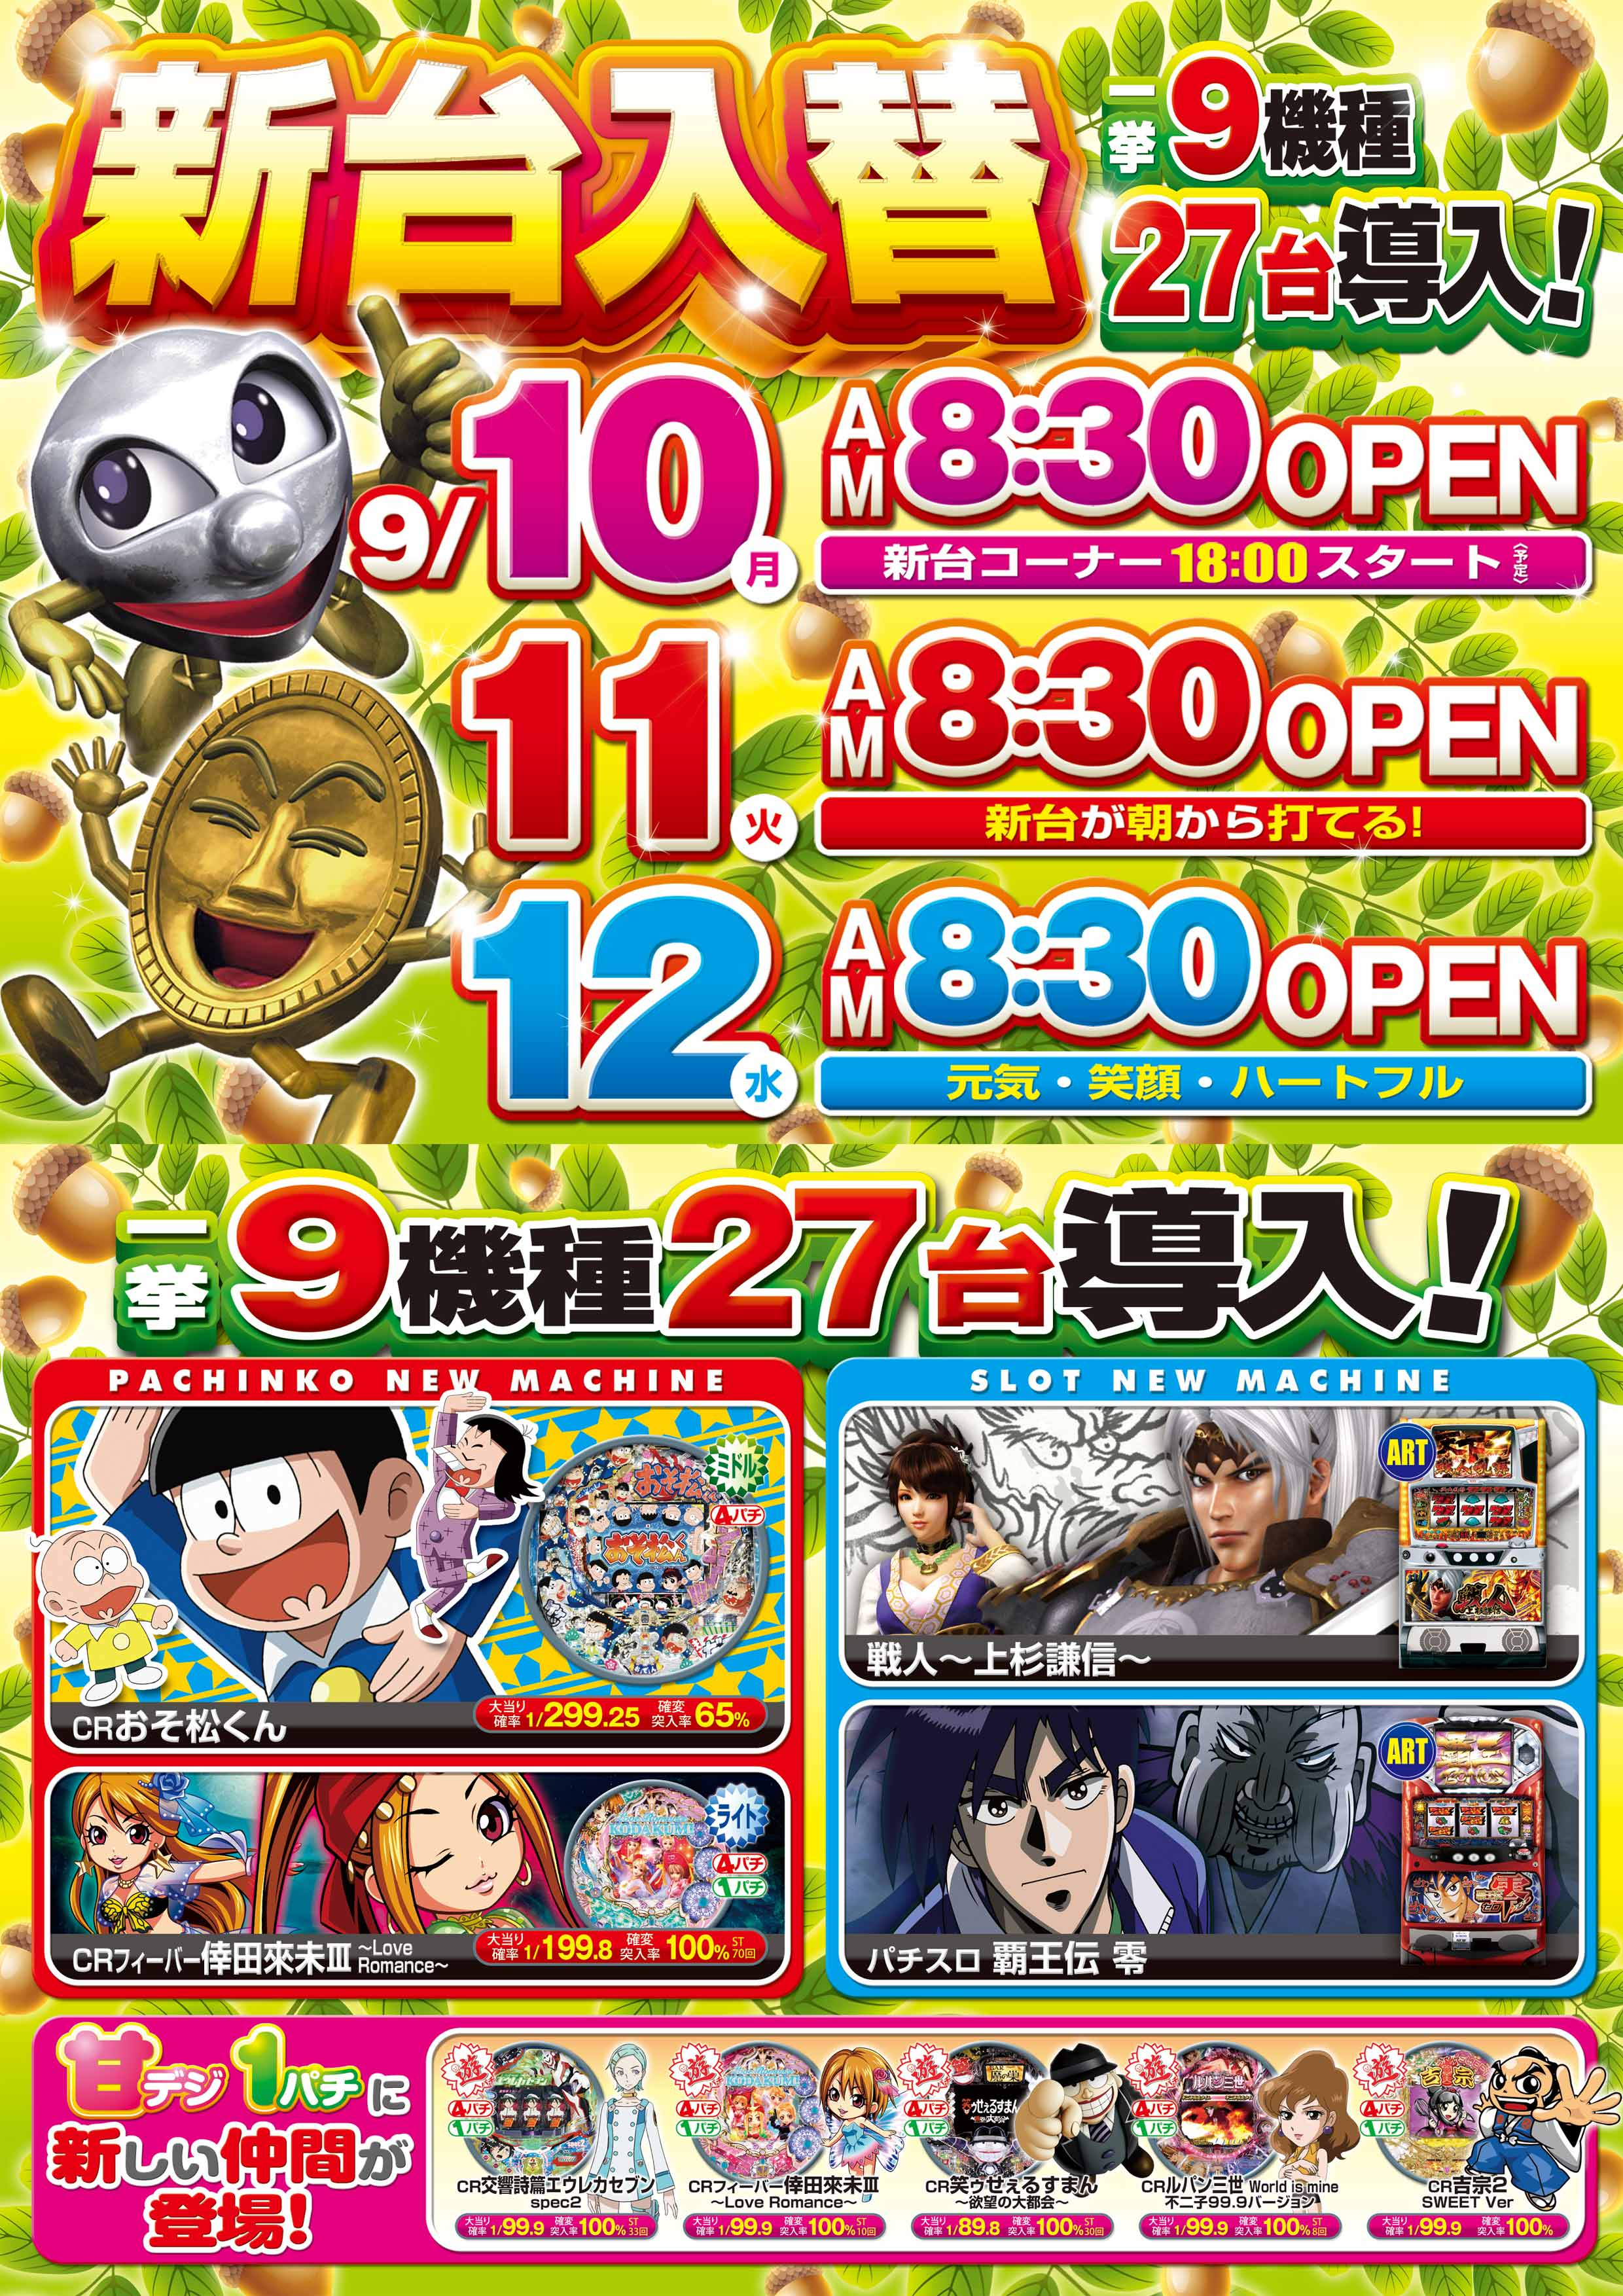 http://jam-fc.jp/information/images/misawa9.10.jpg